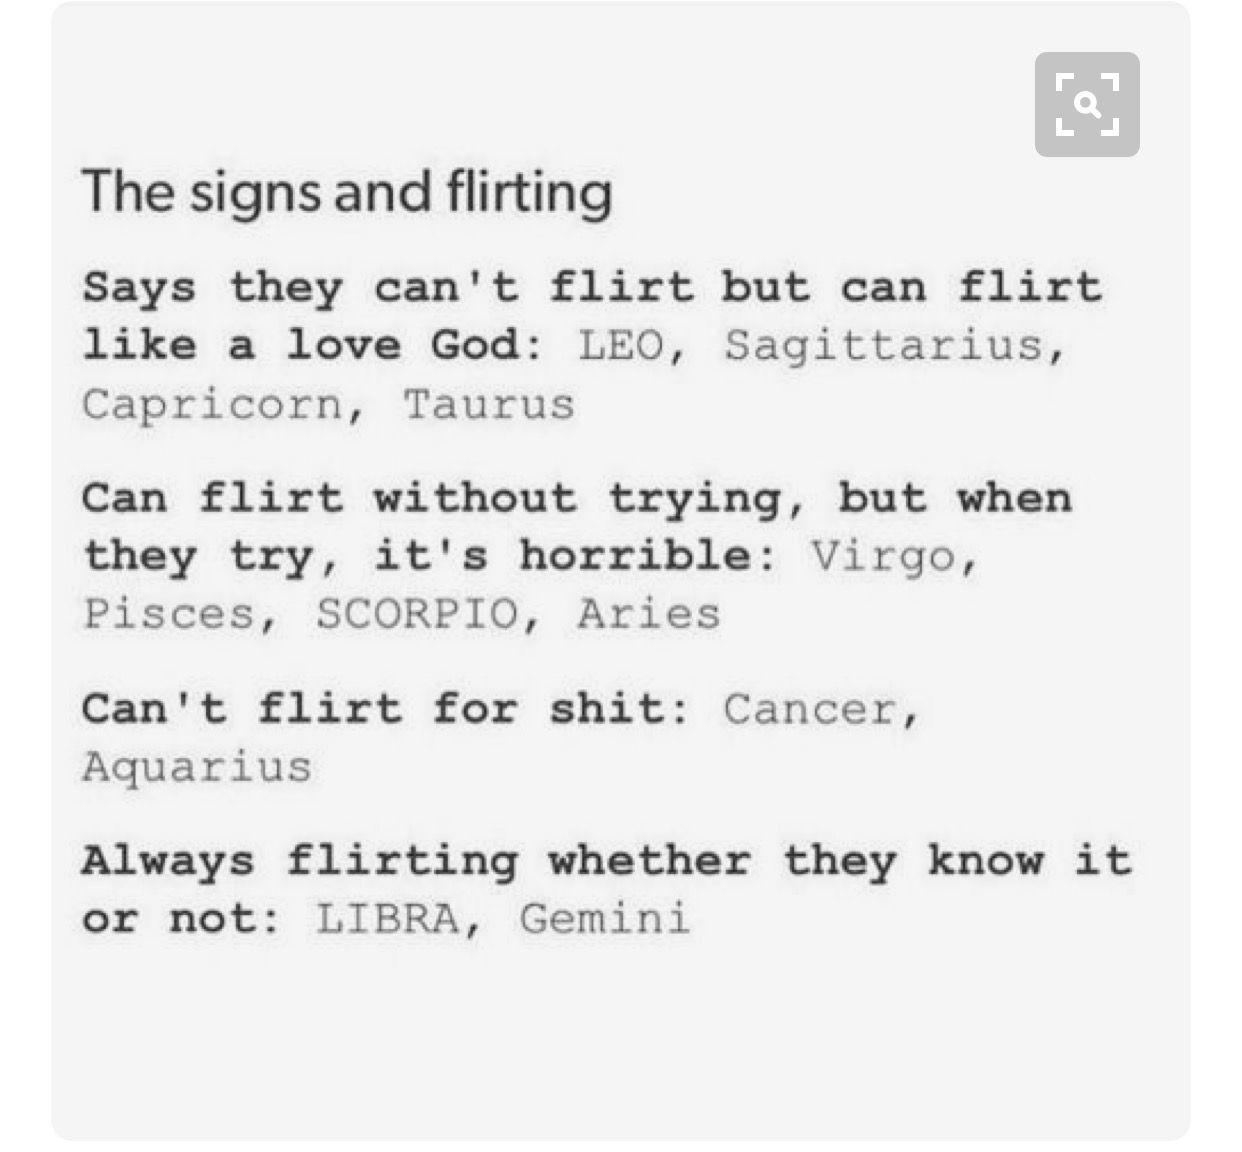 flirting signs: